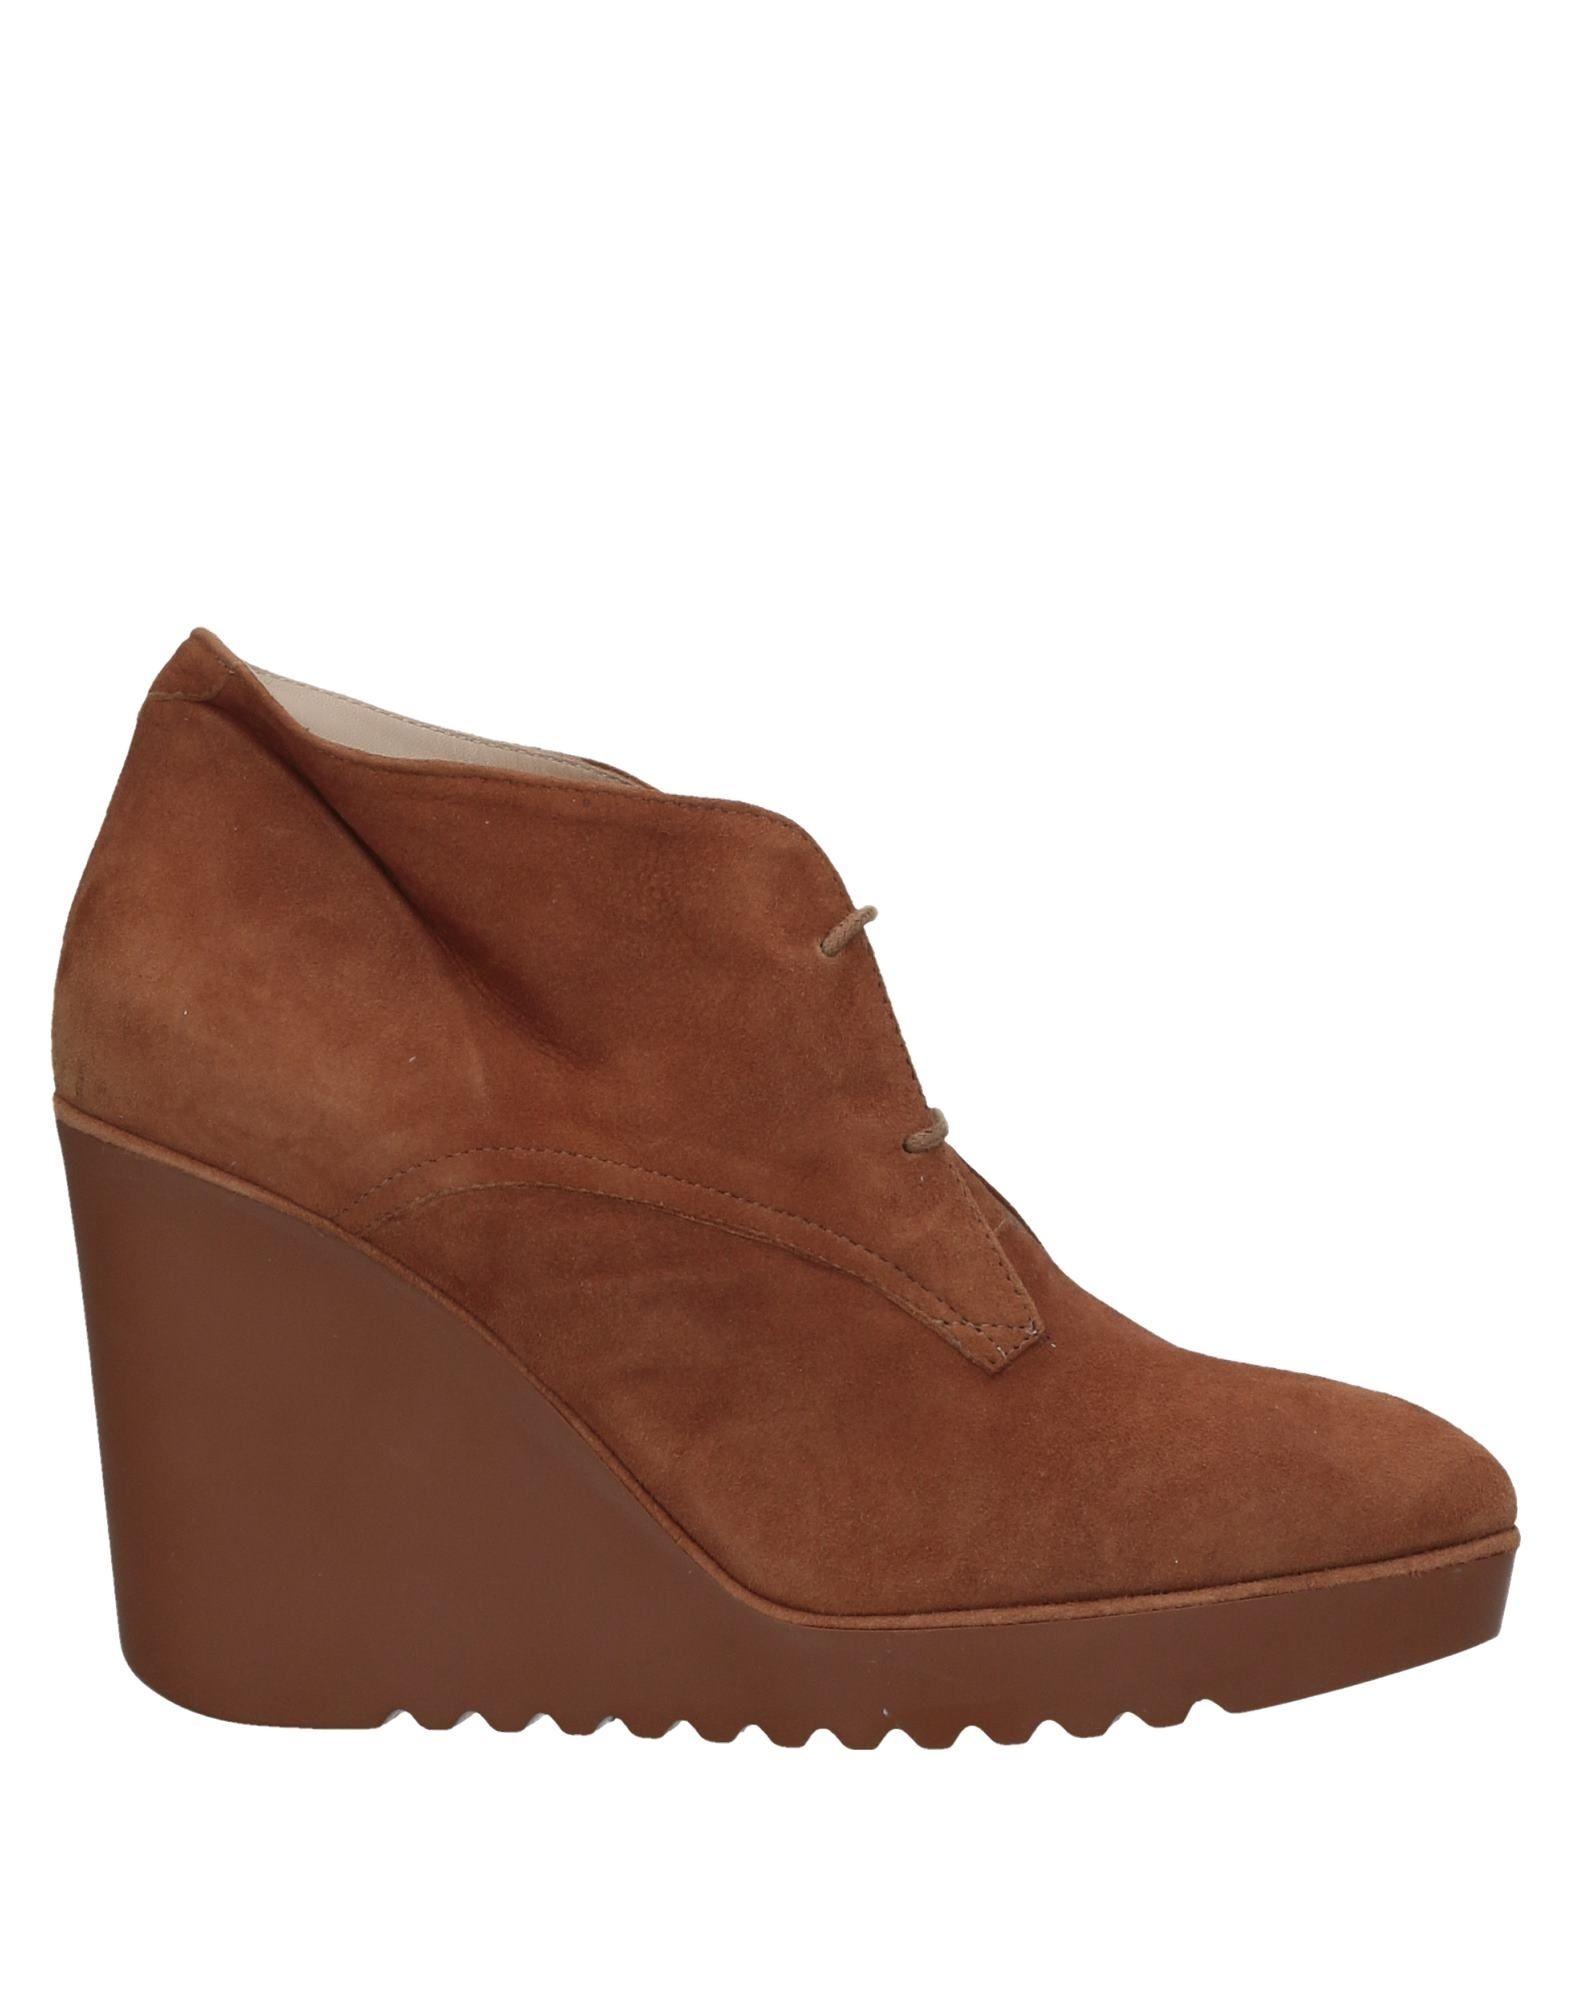 MAX BIANCO Обувь на шнурках max limit обувь на шнурках